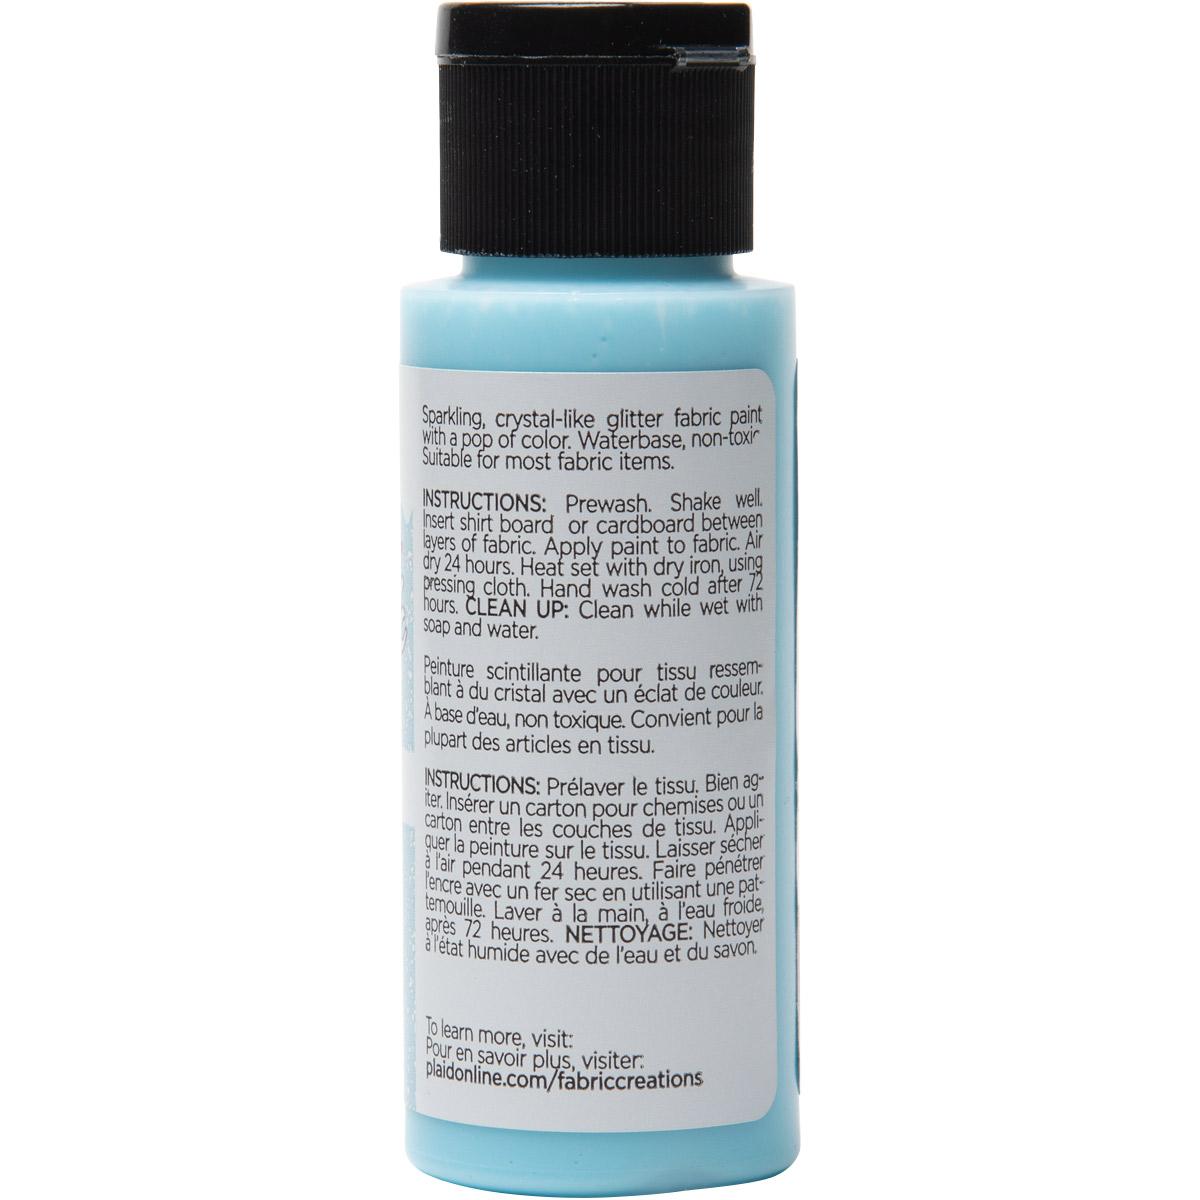 Fabric Creations™ StarStruck Glitter™ Fabric Paint - Light Blue Ice, 2 oz.